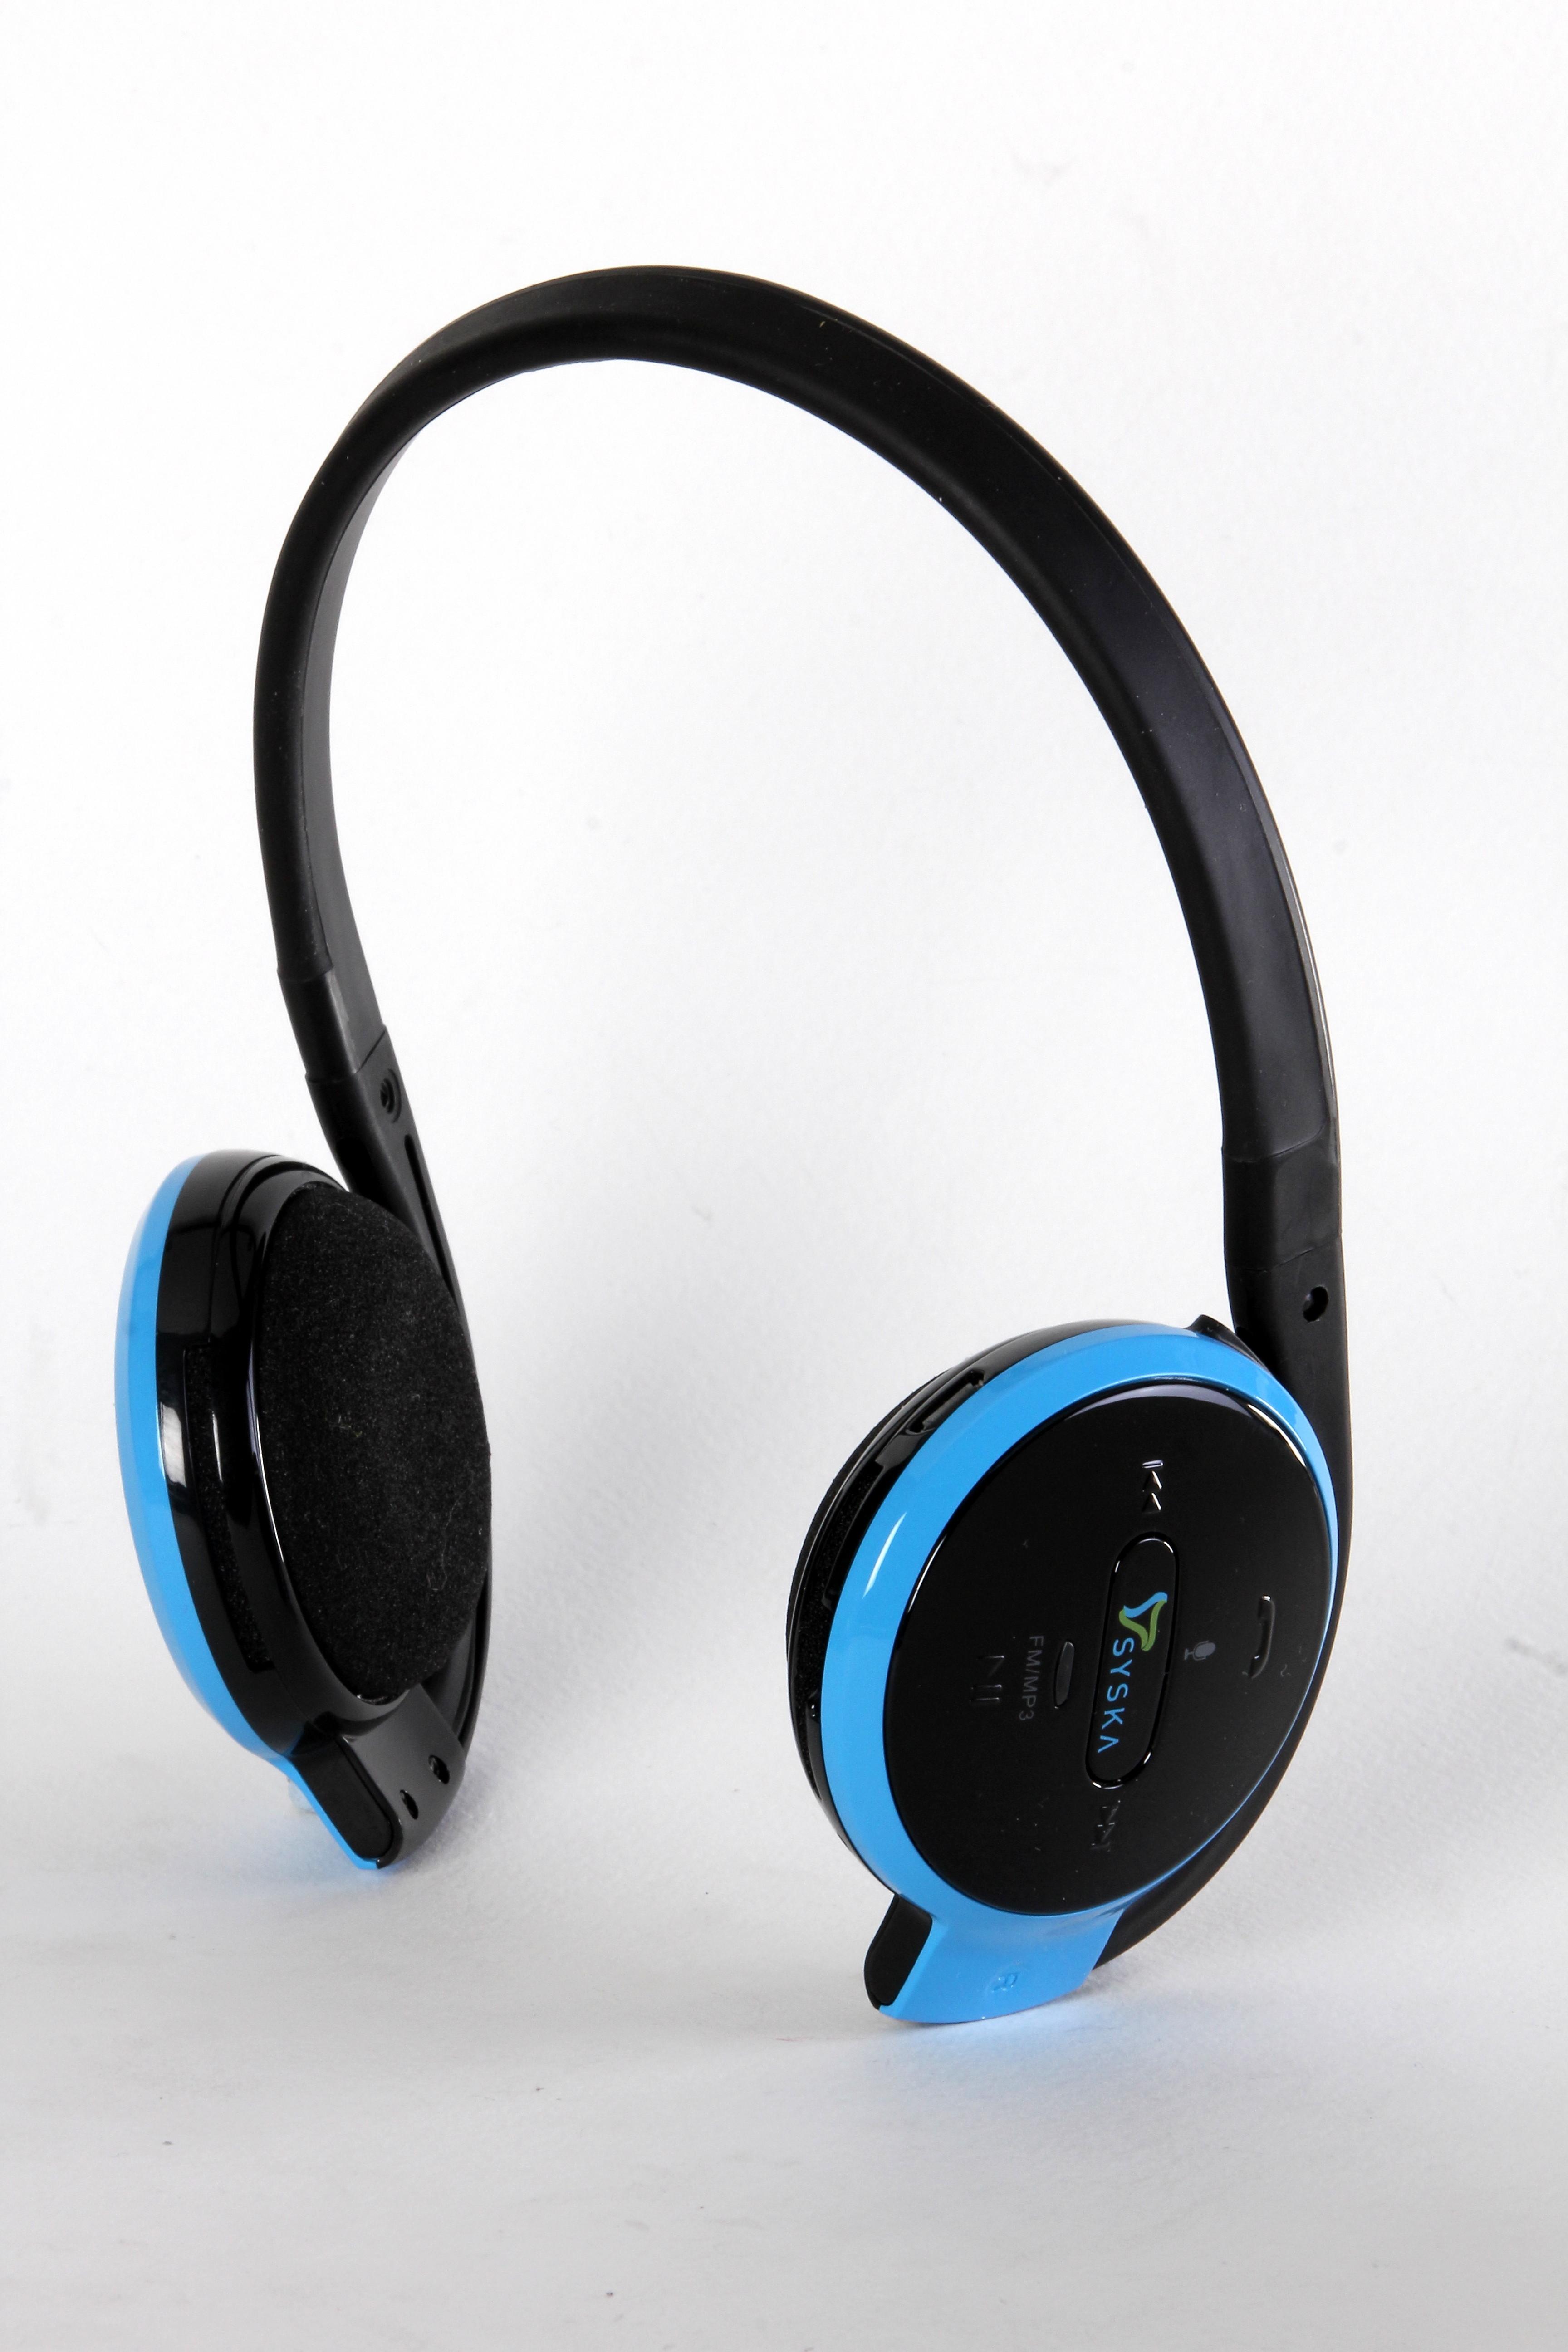 7fc5fabda14 J Headphones Price - Kongoshin Armory - Custom Weapons Crafting